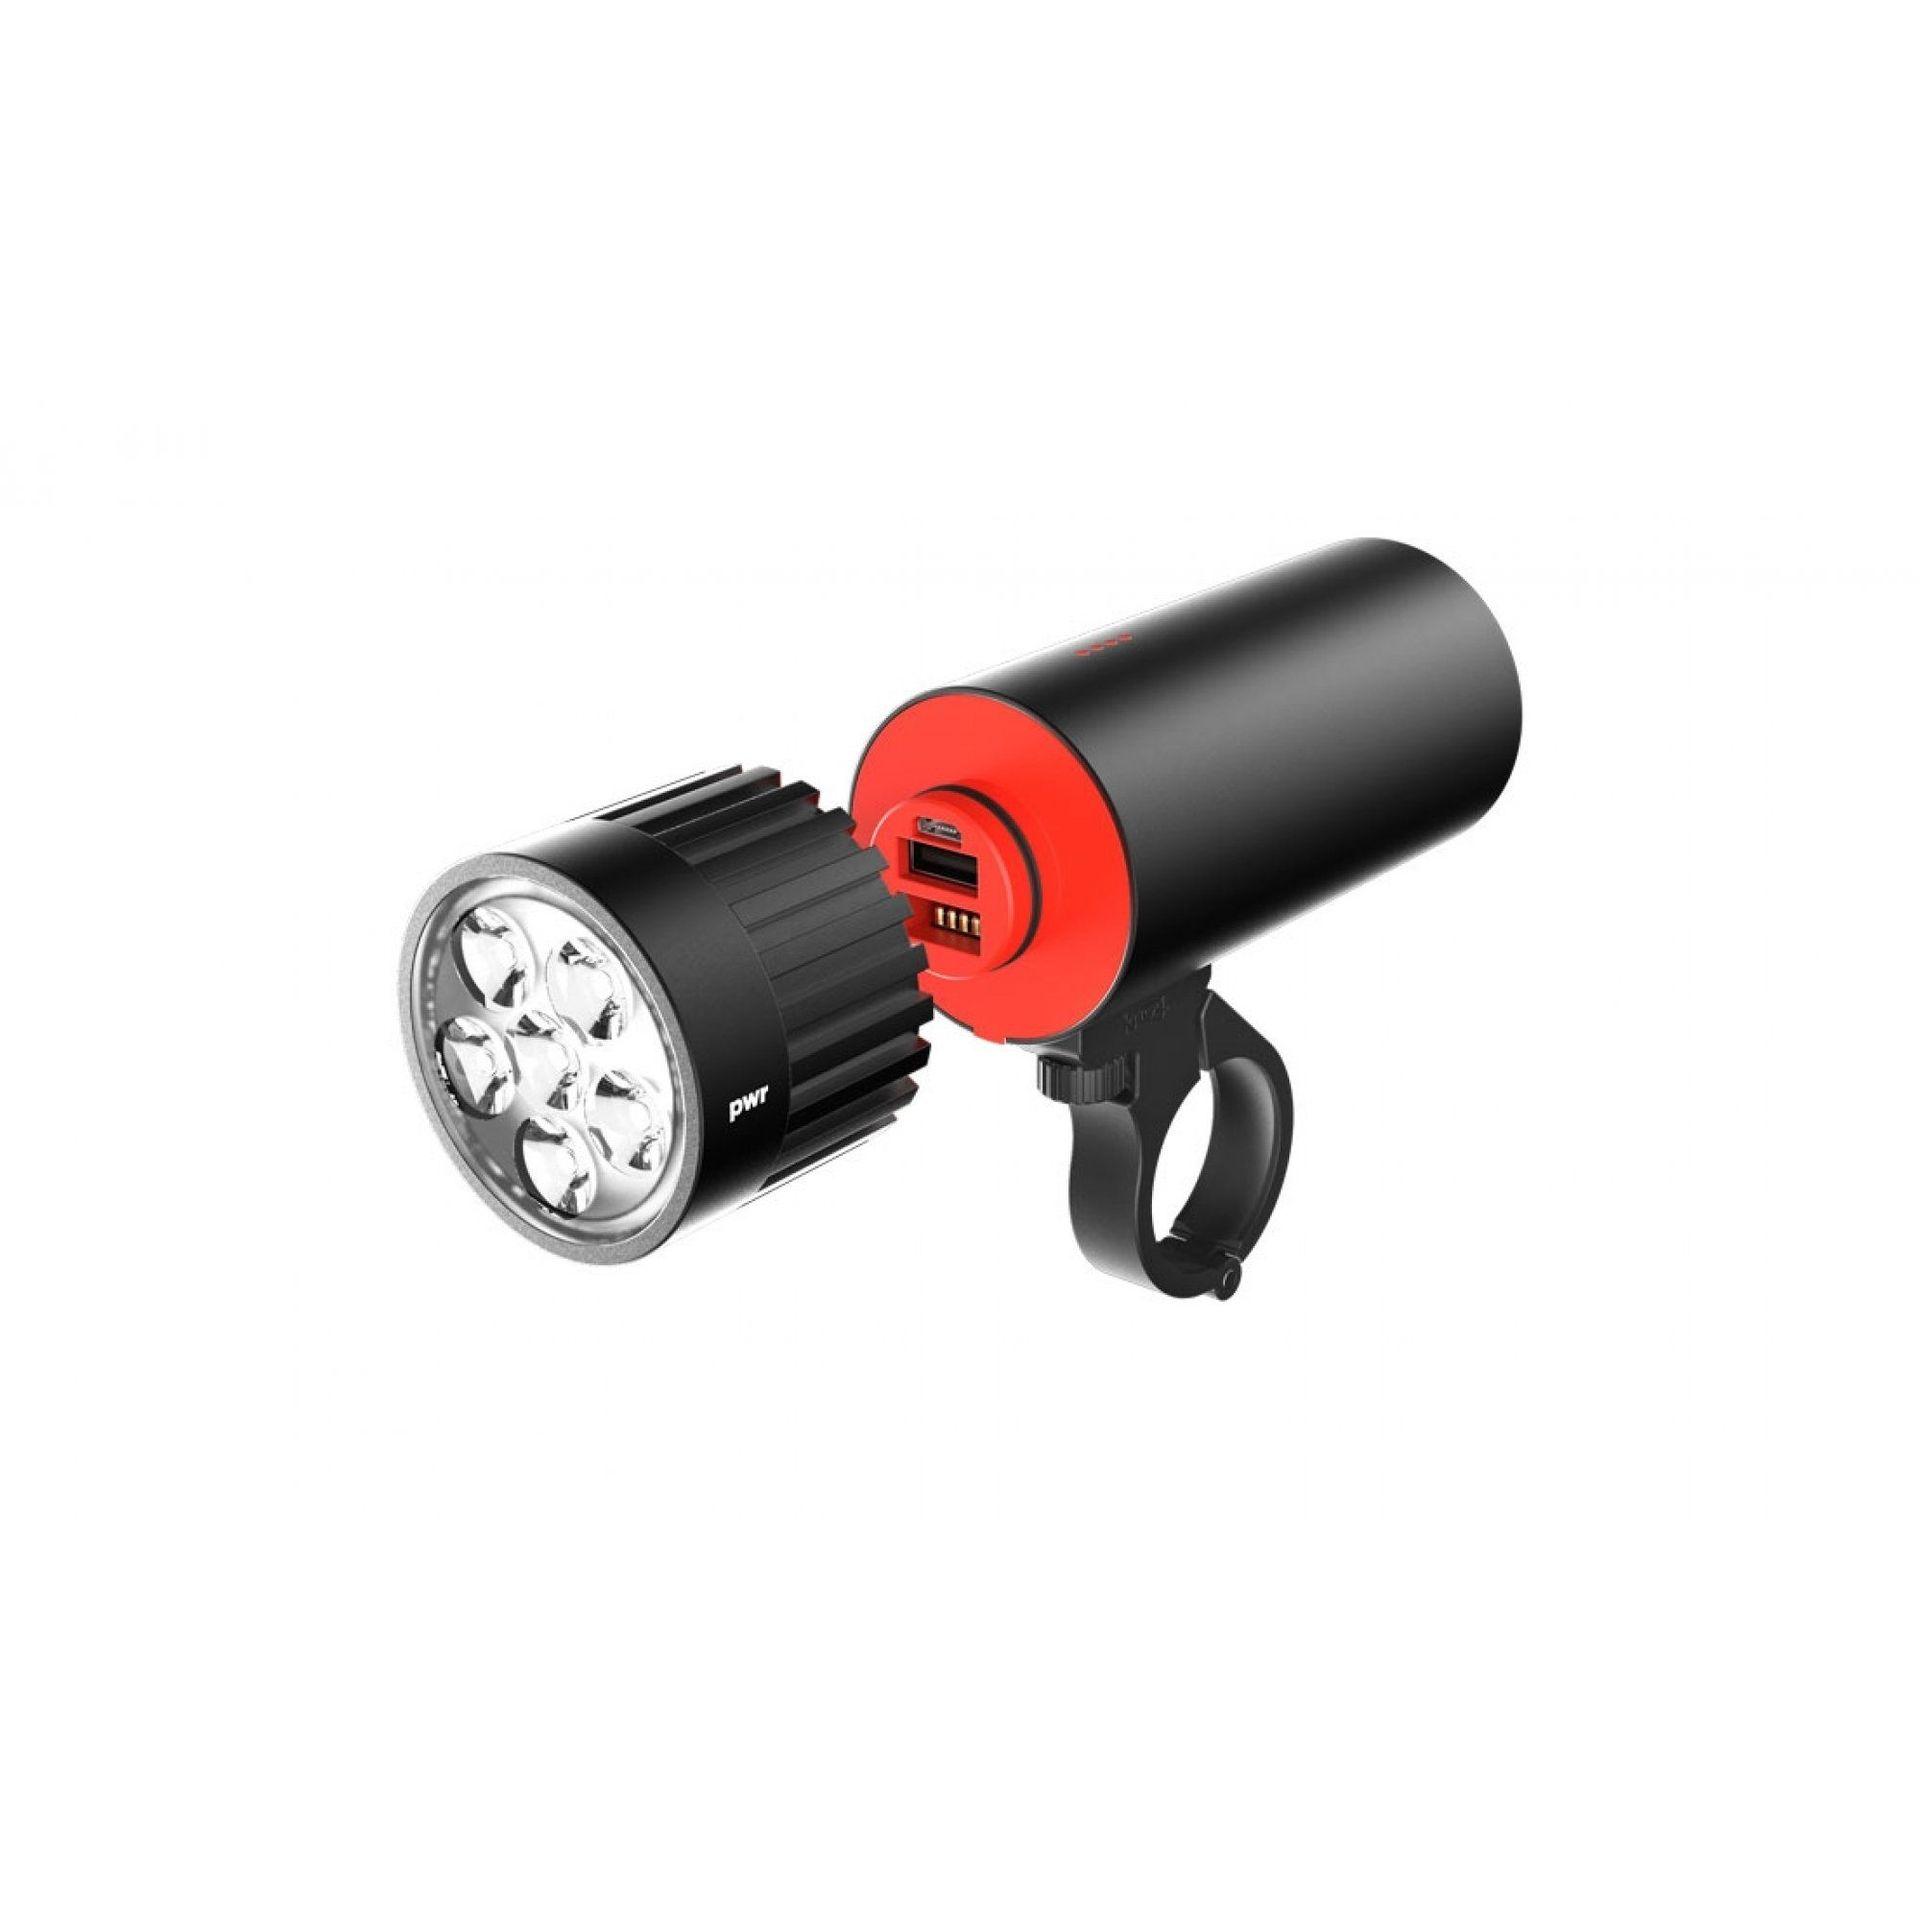 GŁOWICA LAMPKI ROWEROWEJ KNOG PWR LIGHTHEAD 2000L BLACK 1